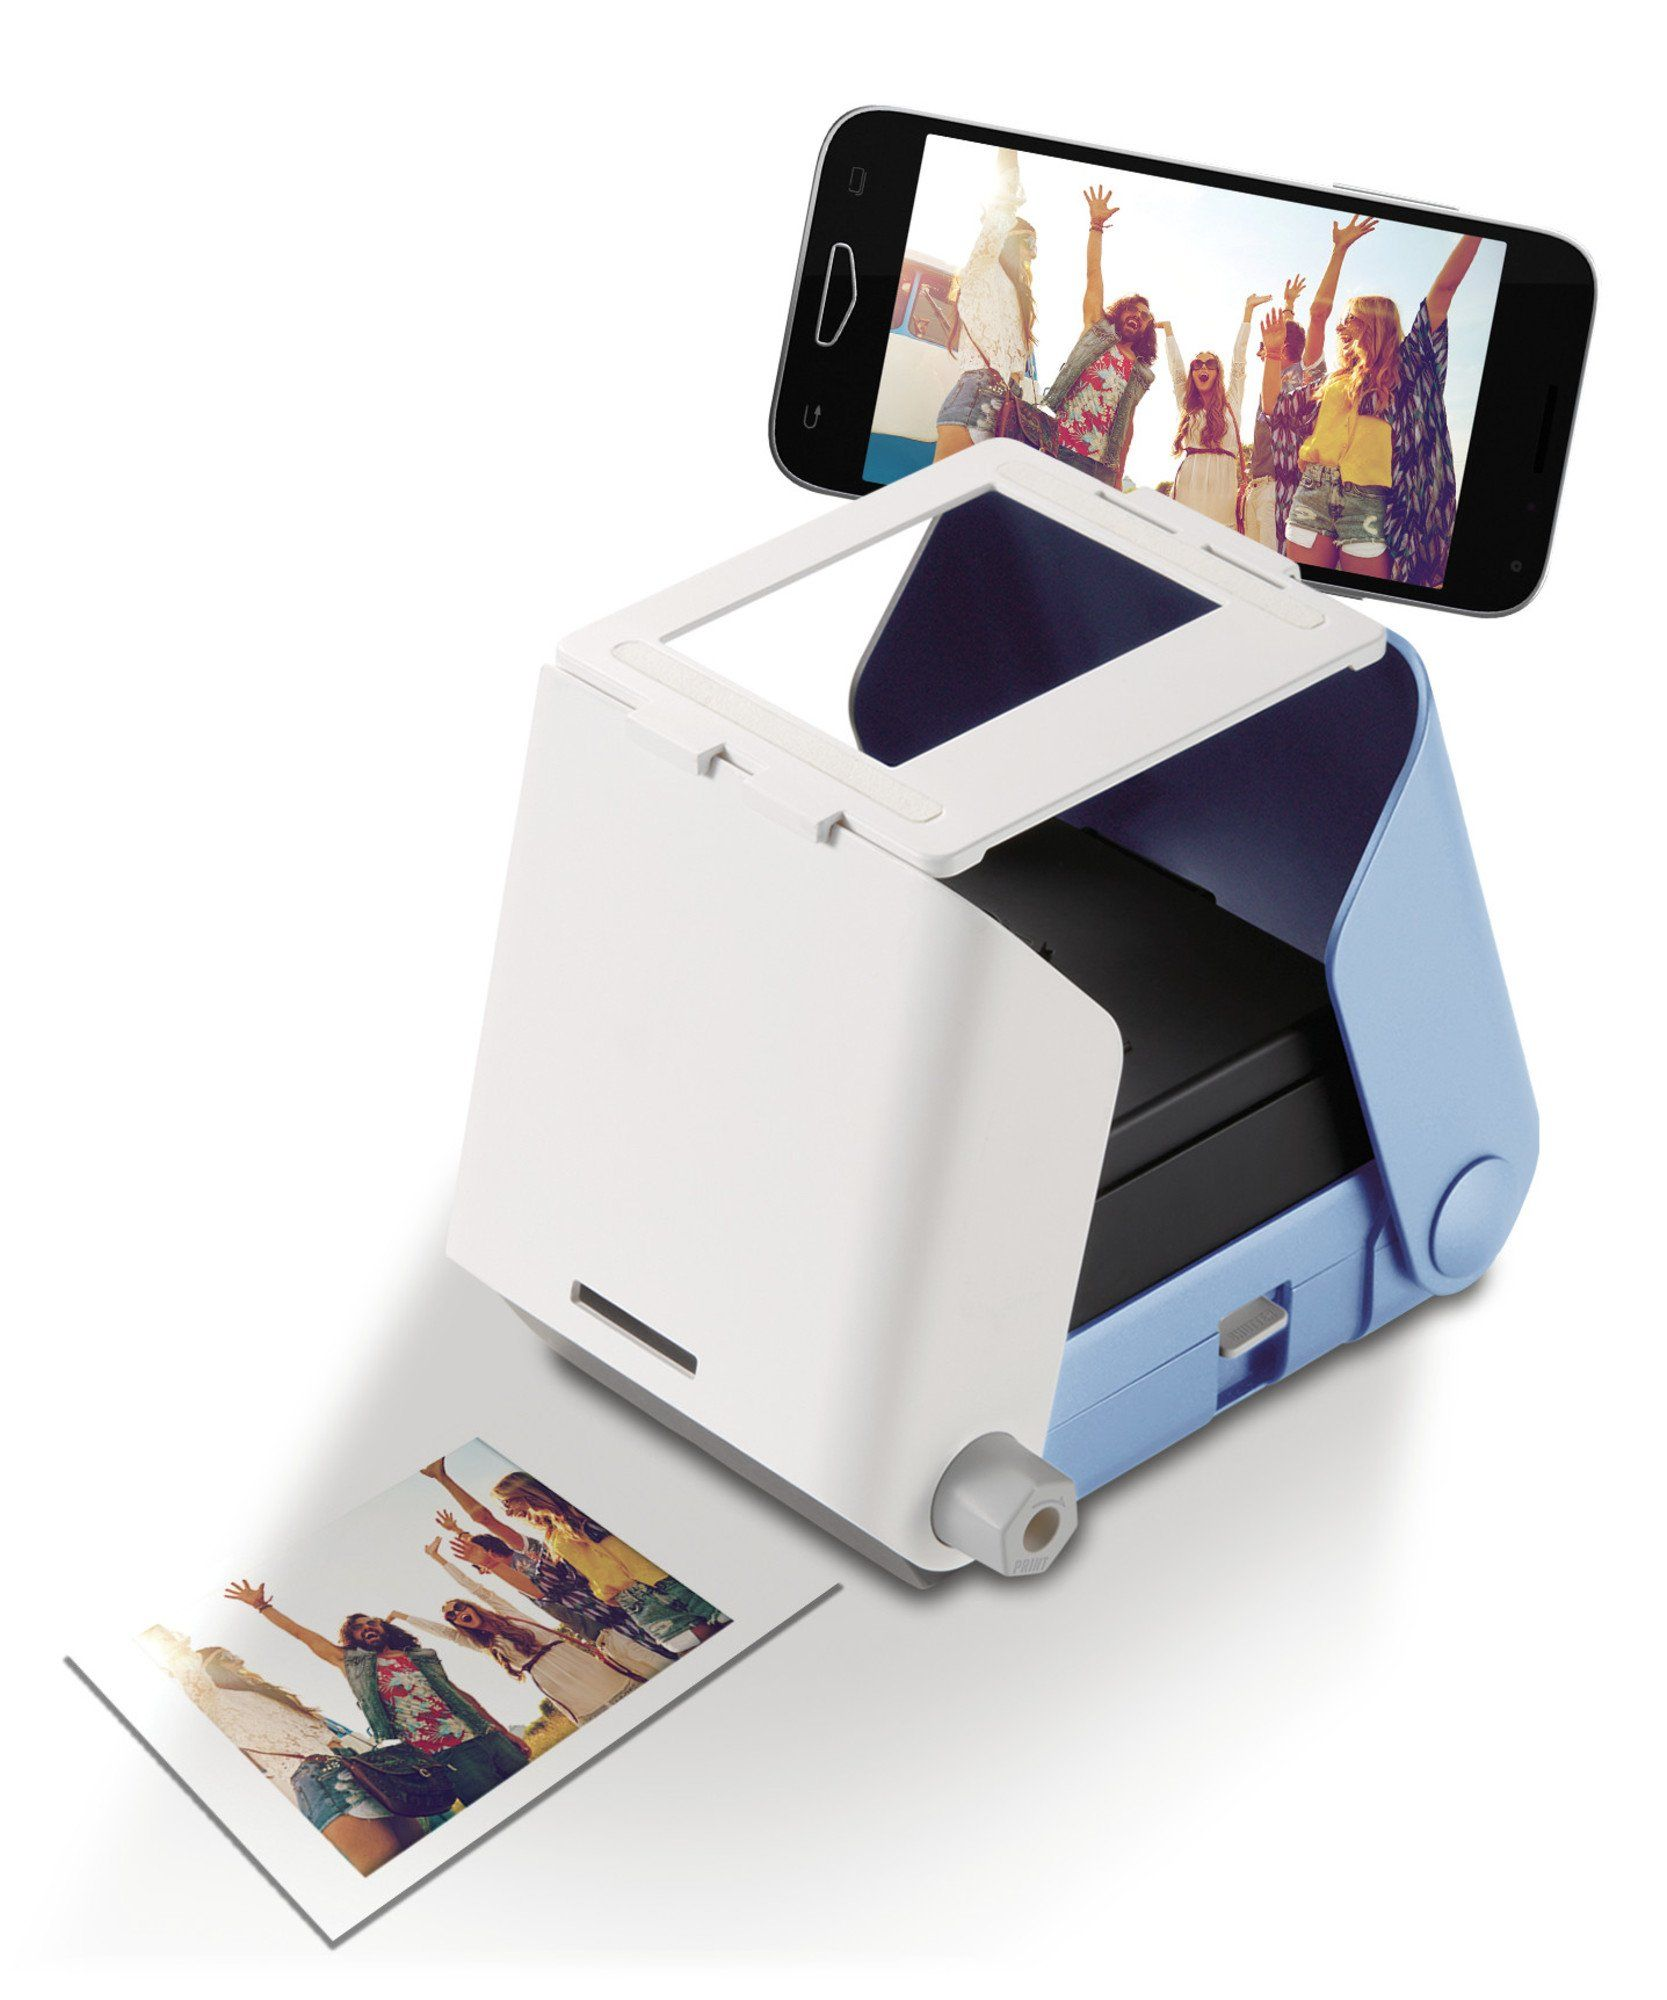 Kiipix Impresora De Fotos Para Smartphone Mx Electrónicos Impresora Fotografica Impresora Impresora Portatil